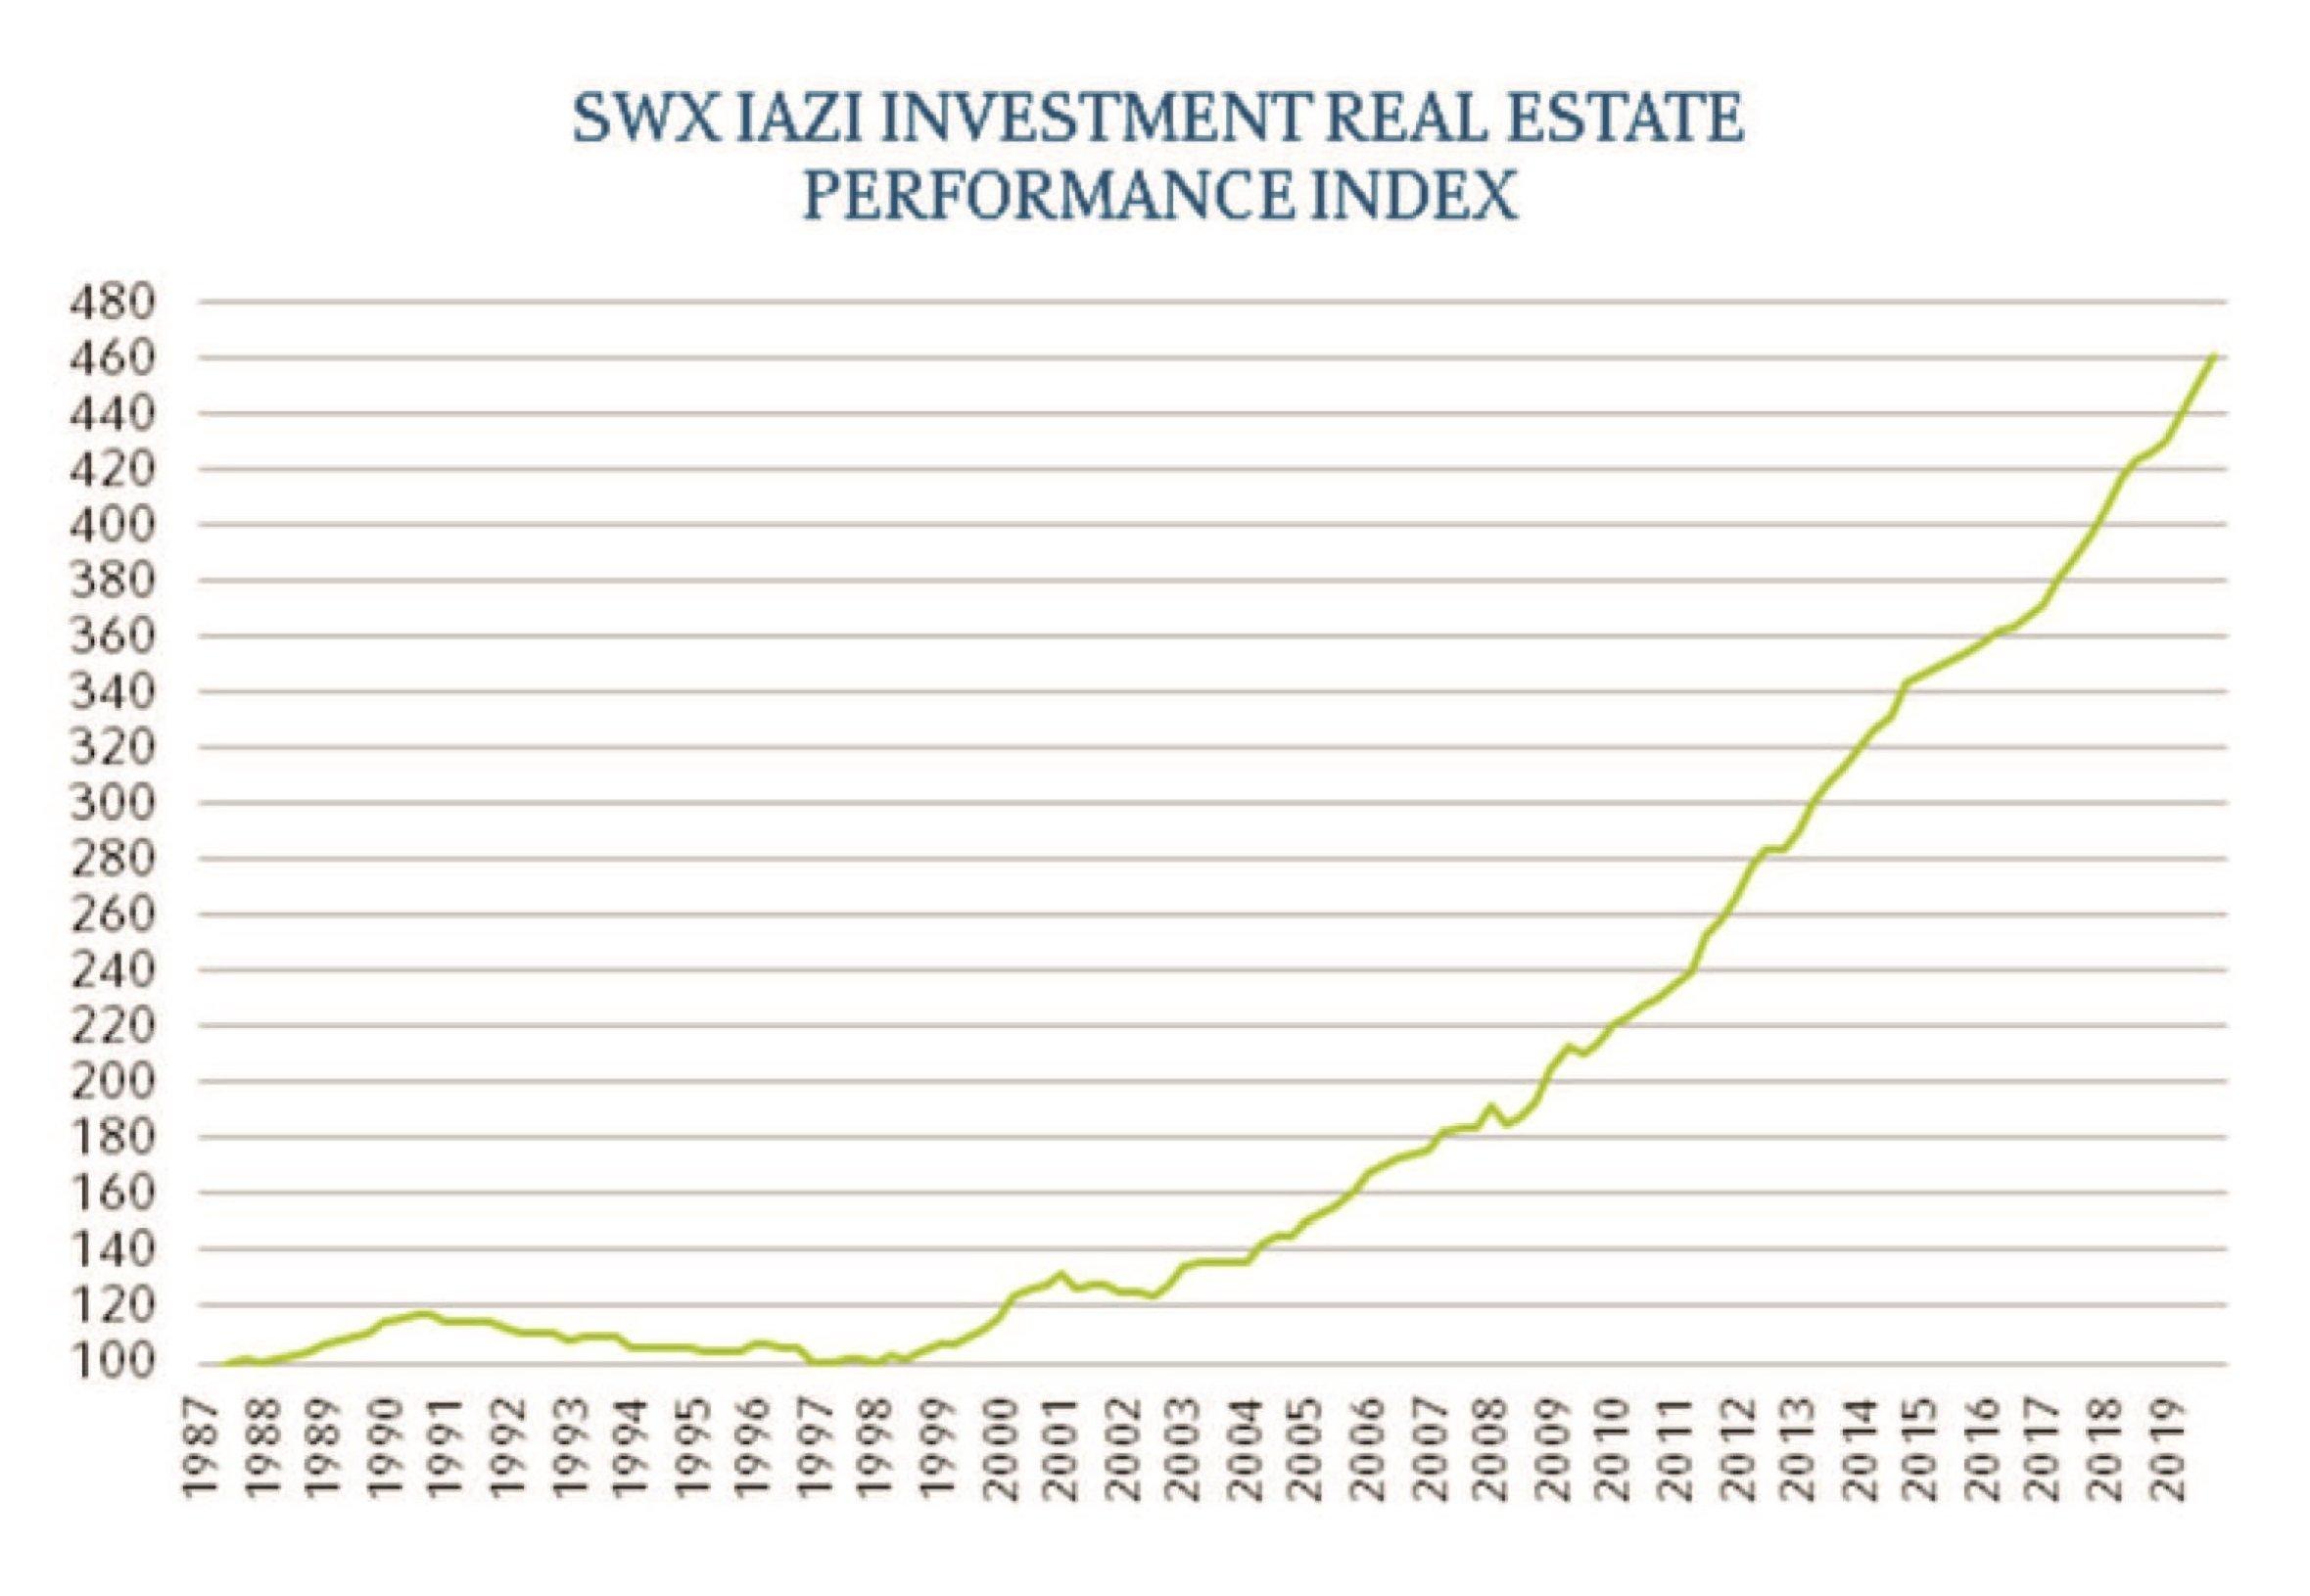 Performance immobilier suisse - IAZI - total return